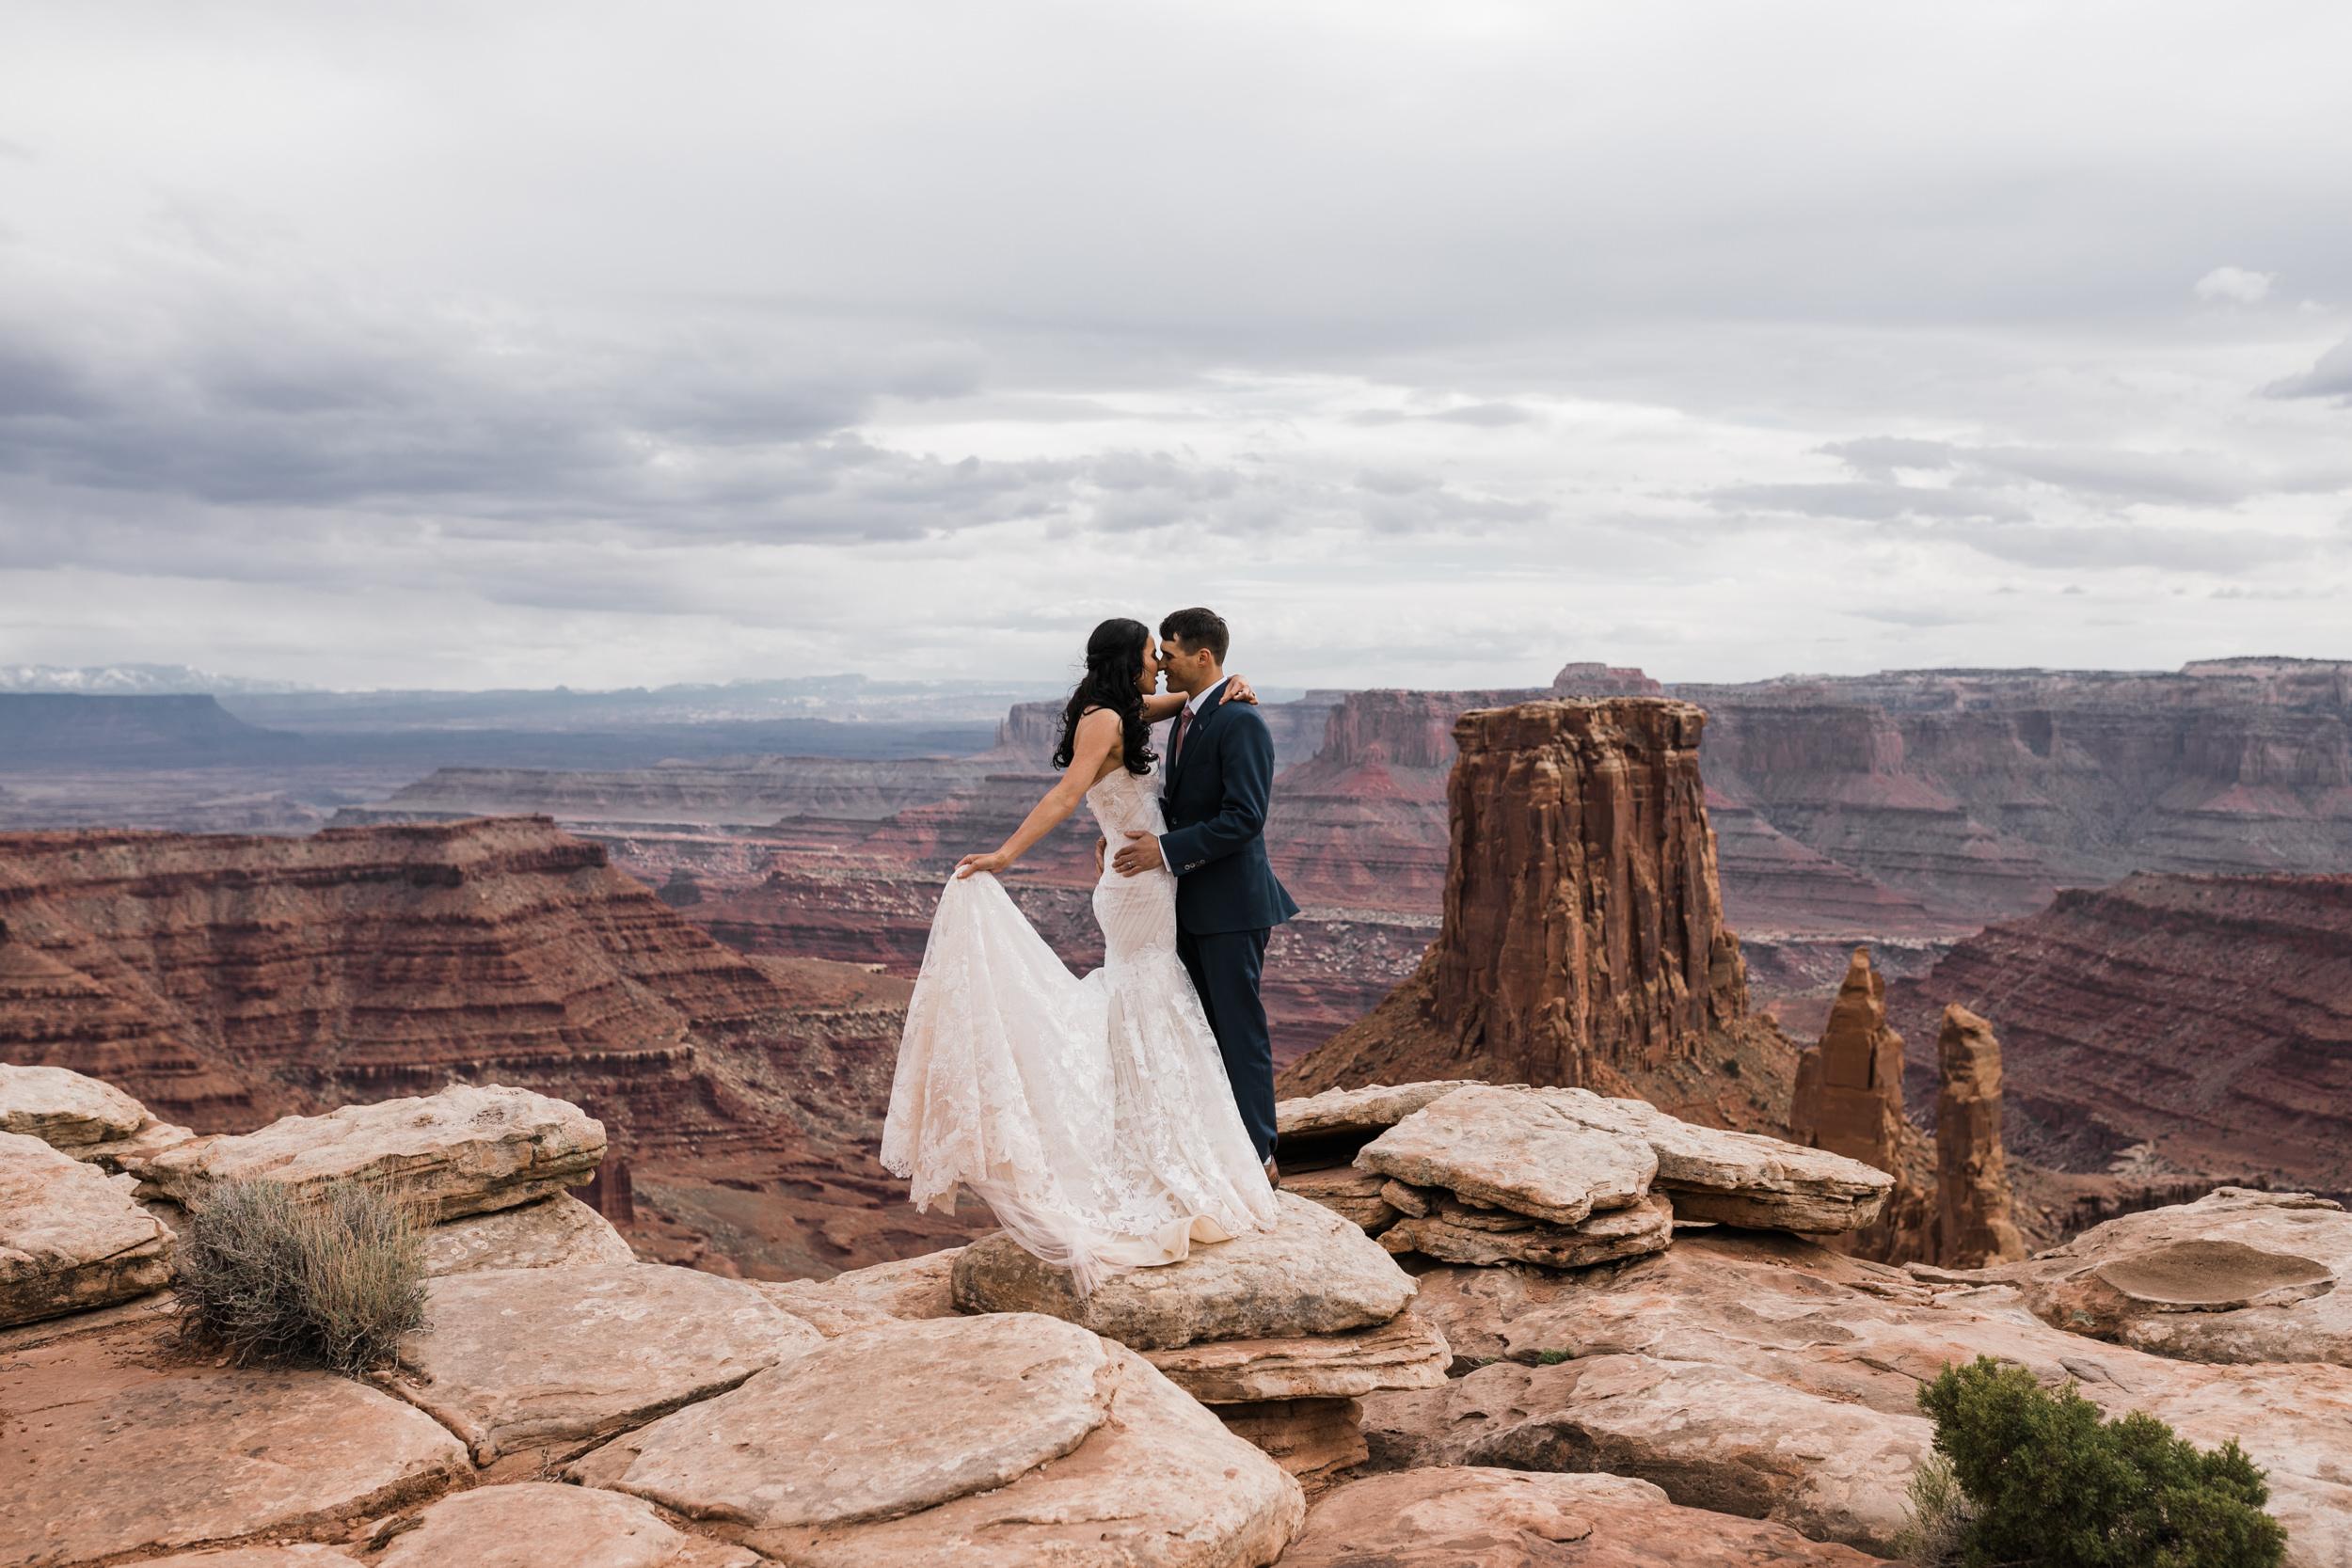 Jeep-Wedding-Moab-Utah-Hearnes-Adventure-Elopement-Photography-25.jpg